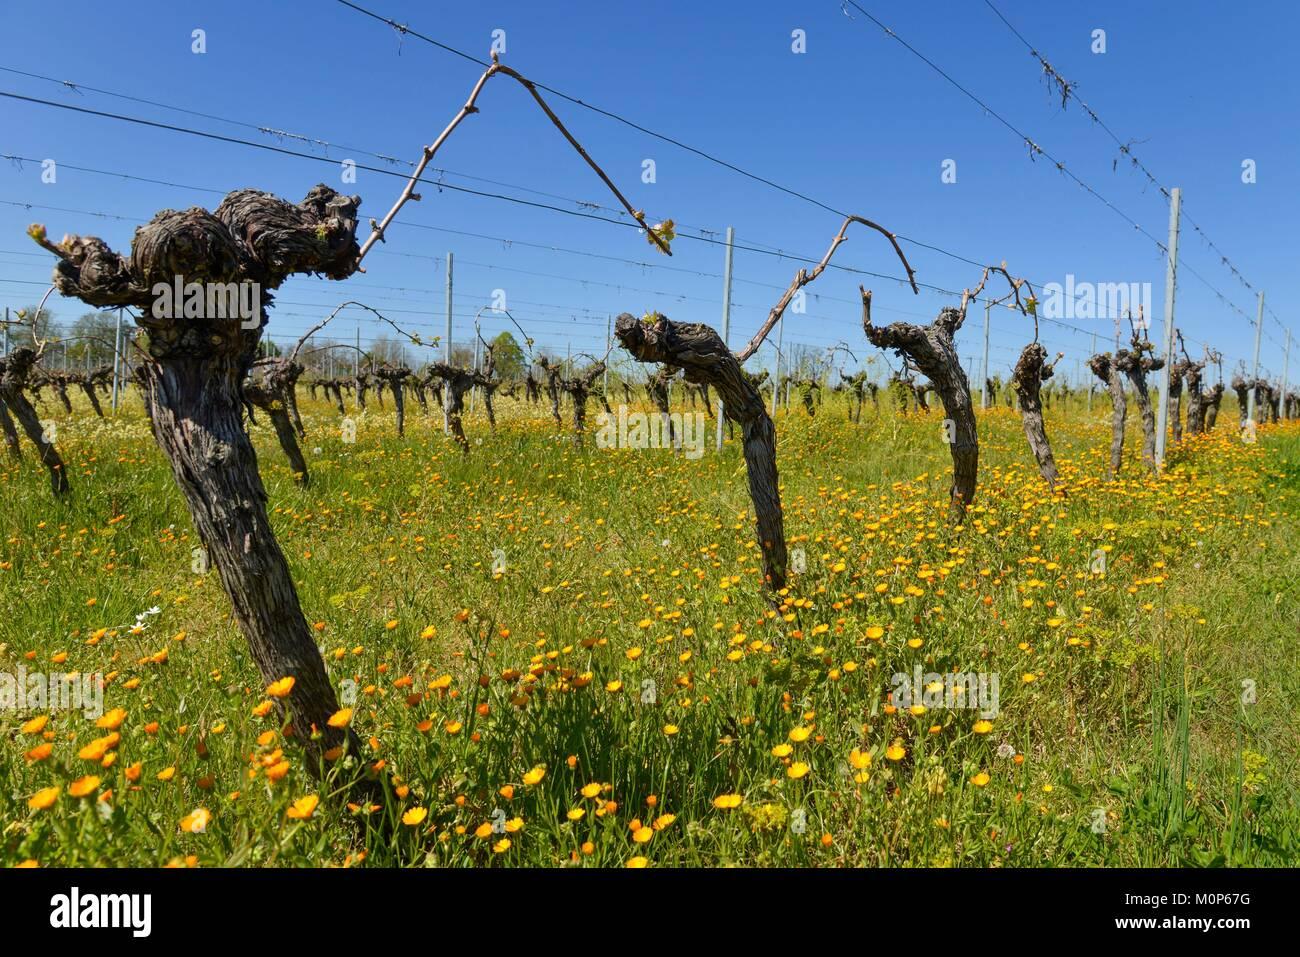 France,Dordogne,Montbazillac,vine stocks - Stock Image